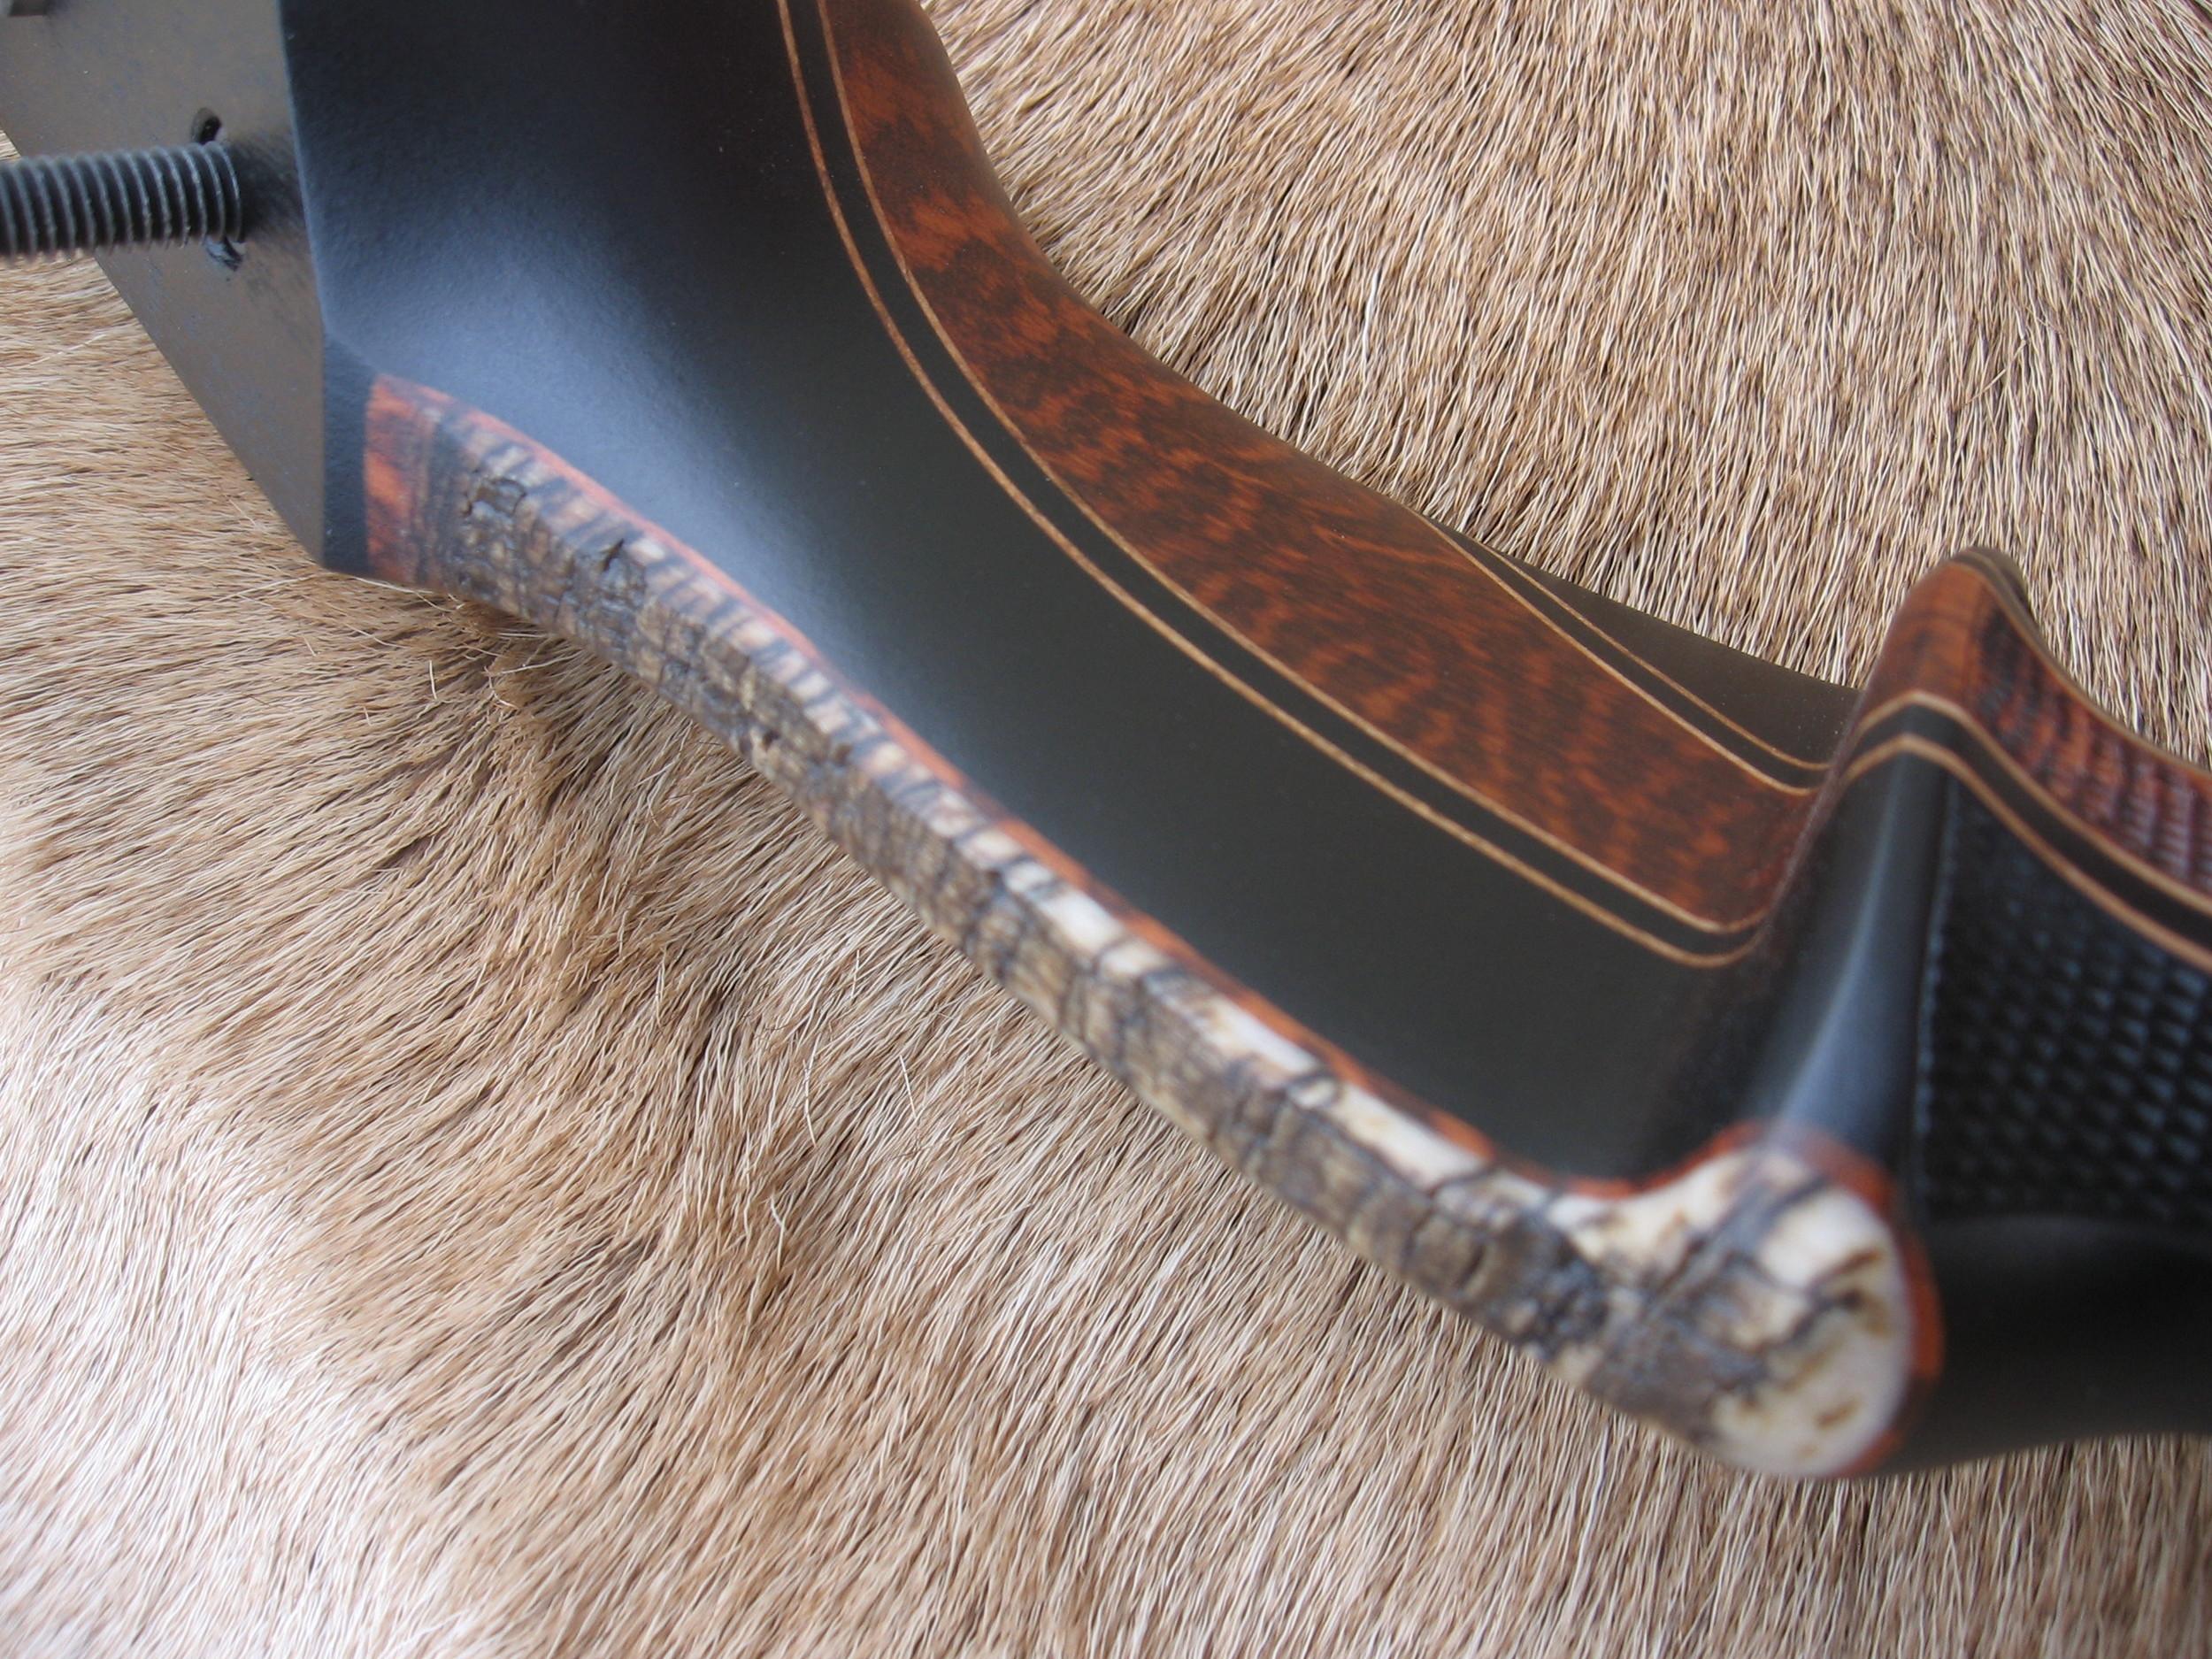 Rough Sheep Horn overlay